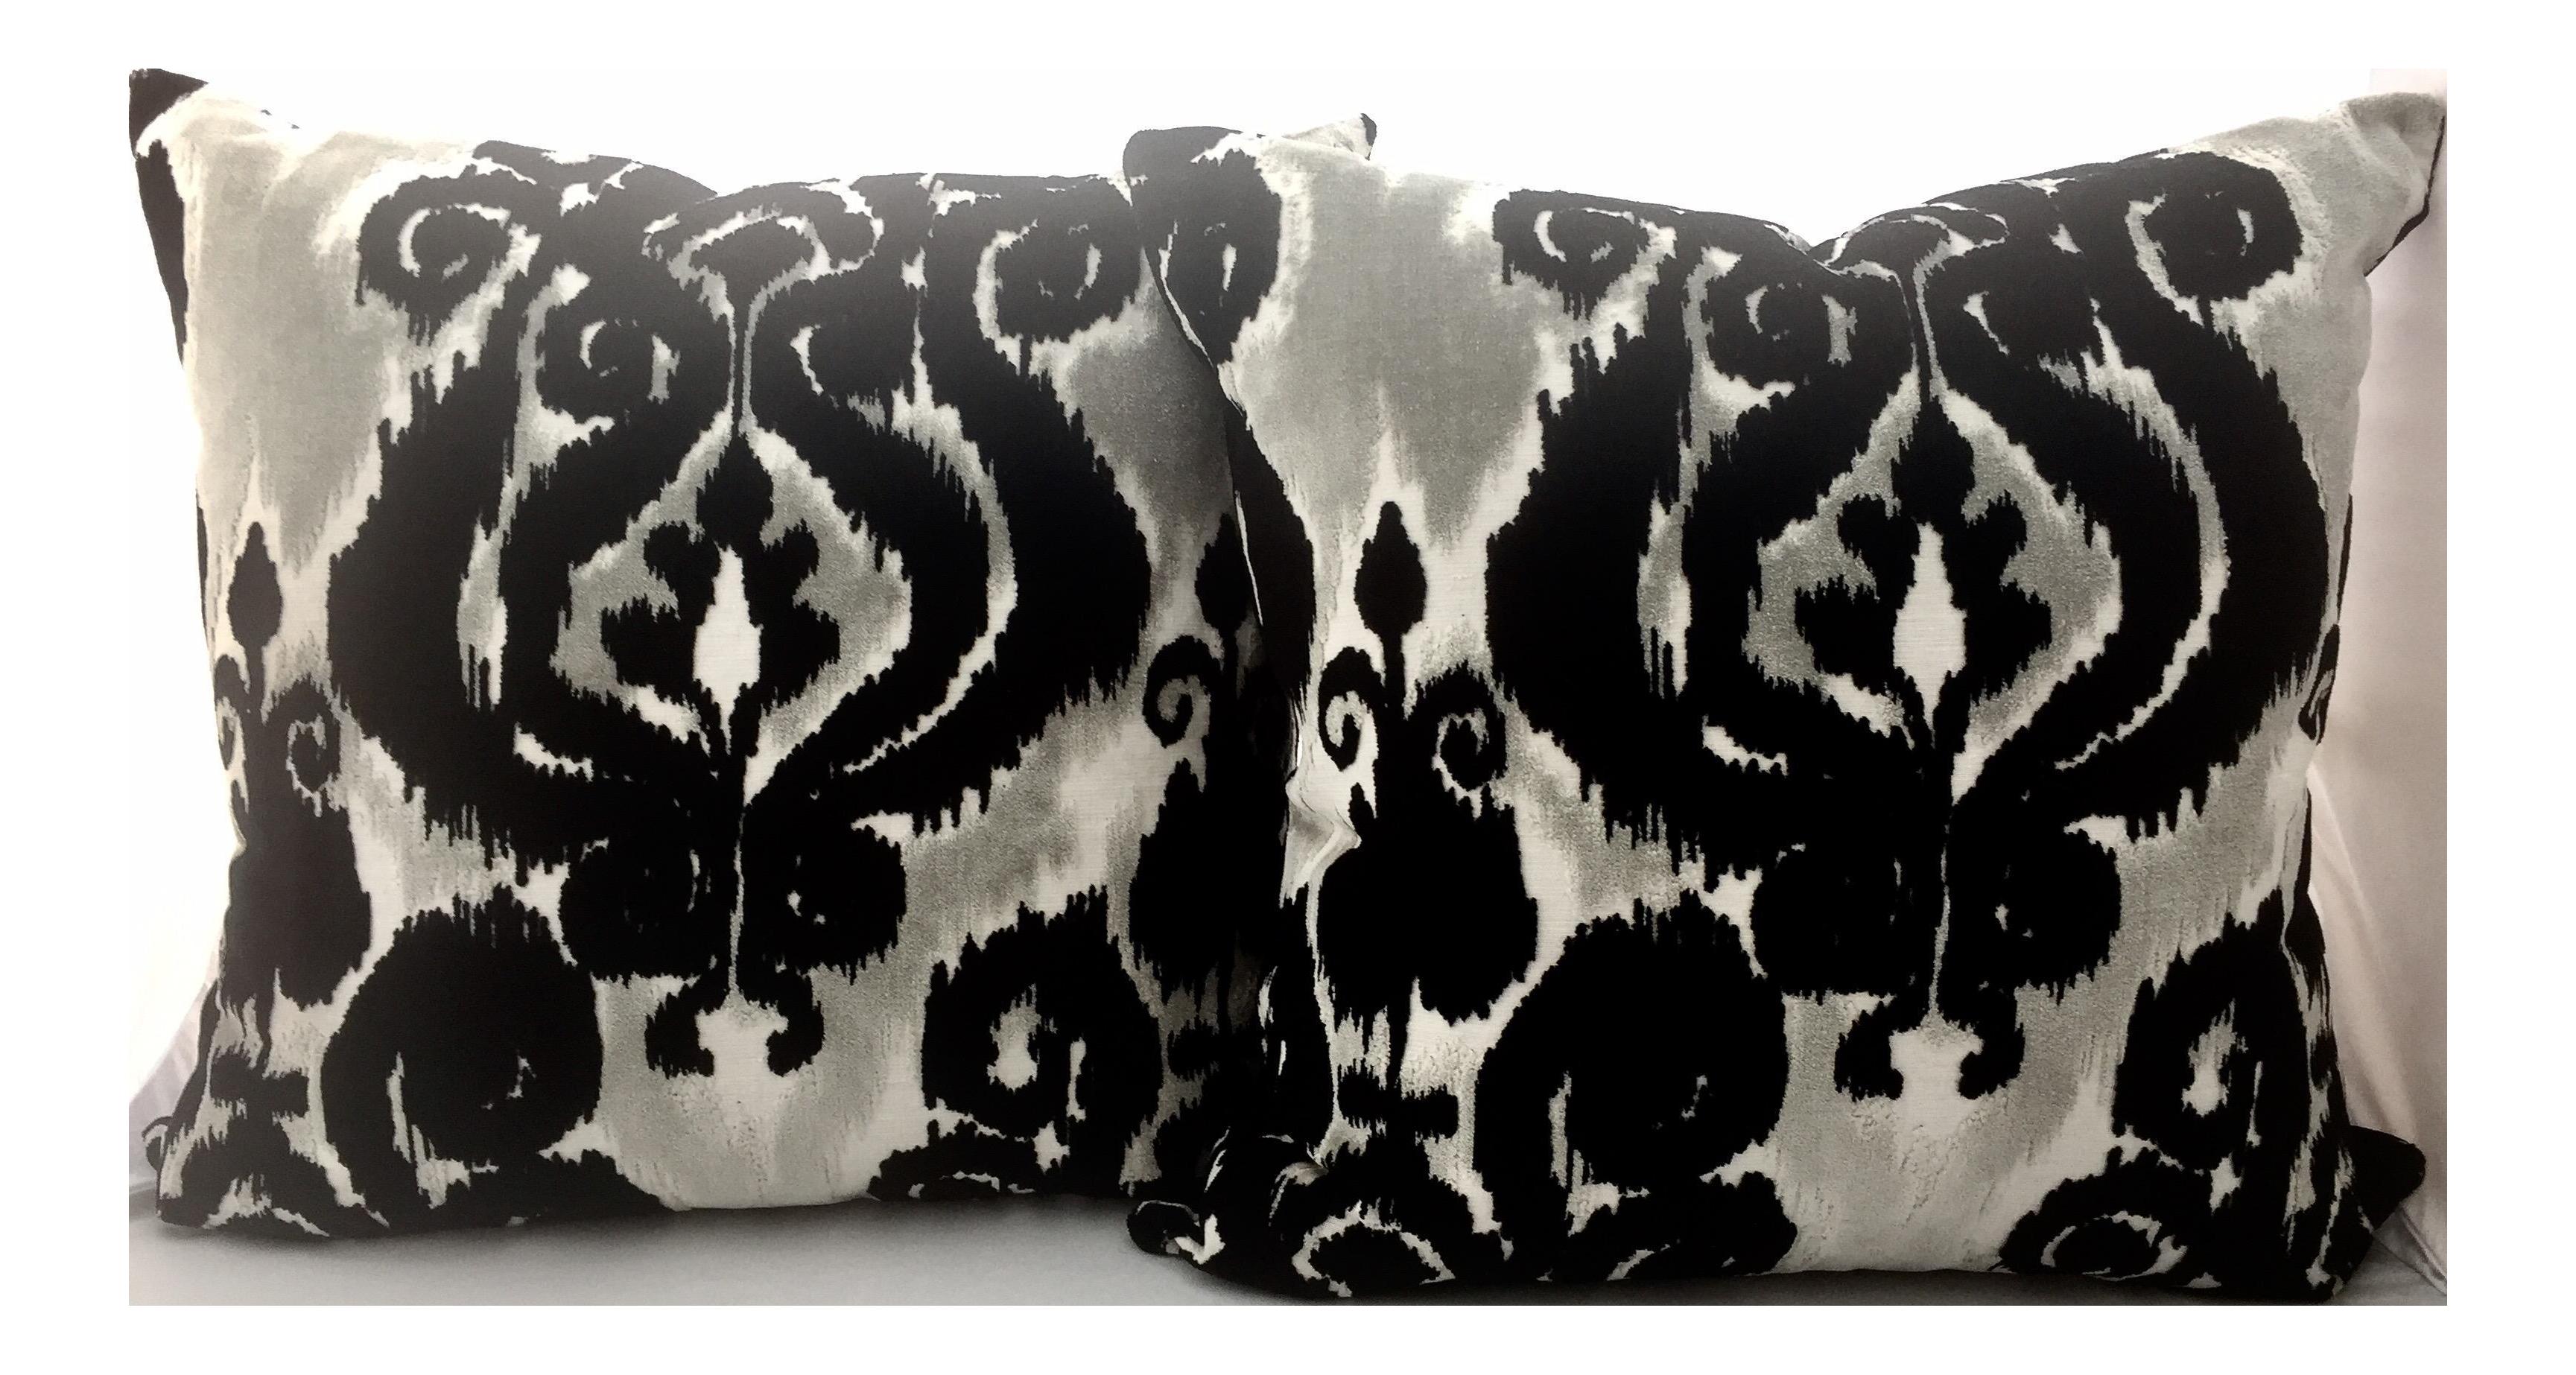 Damask Black and White Ikat Velvet Pillows - a Pair Chairish